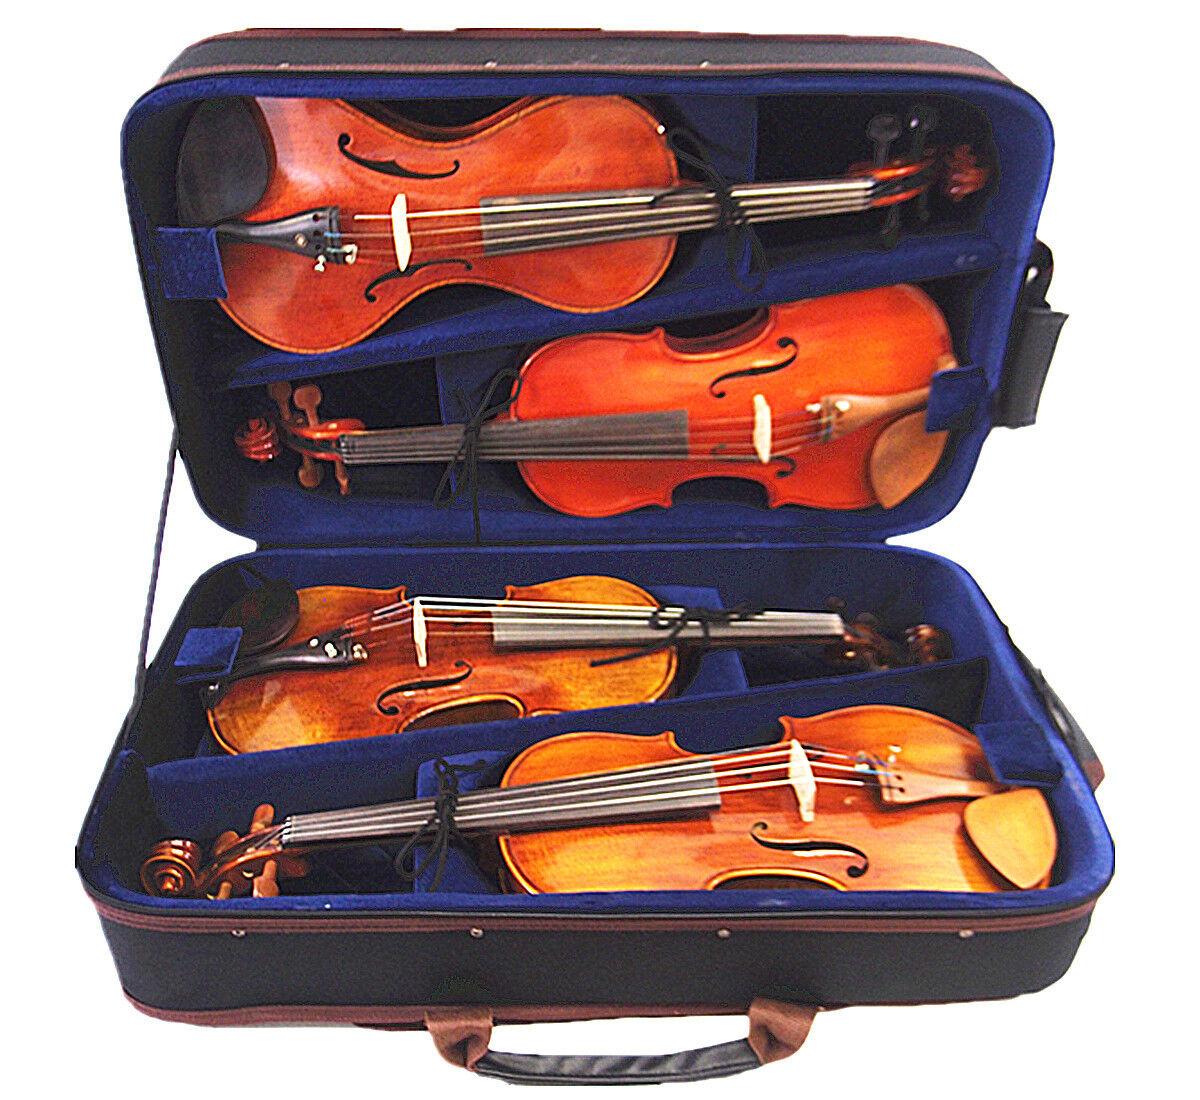 Neuer Profi.Holz 4 4 Violin für 4-Stücke Violinen